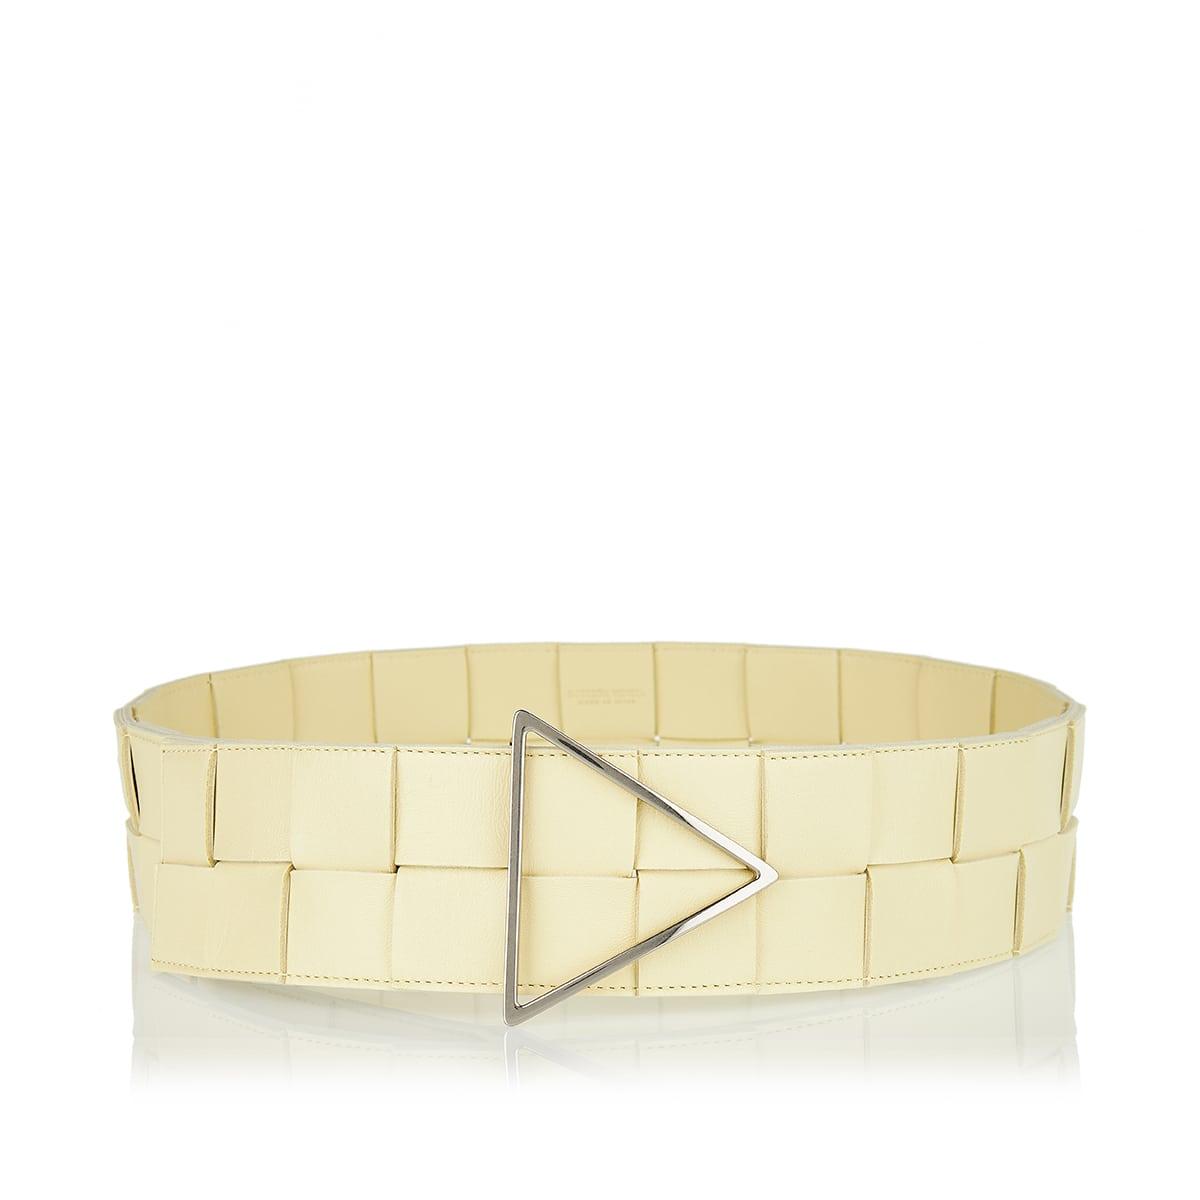 Maxi Intreccio leather belt